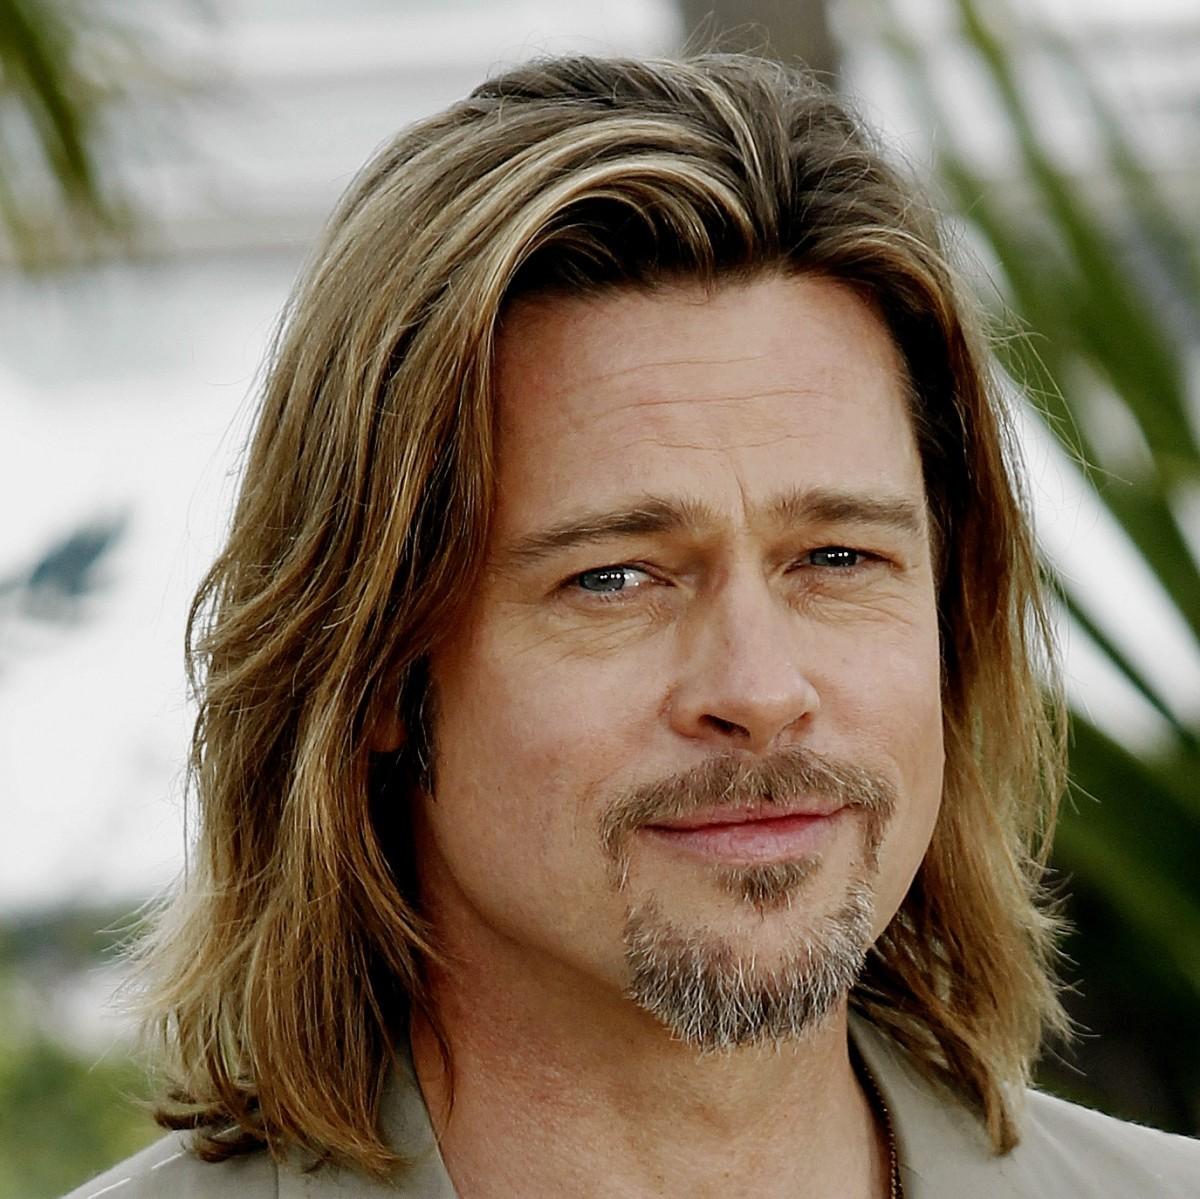 Est-ce Brad Pitt ou Tom Cruise qui a joué dans ce film ?